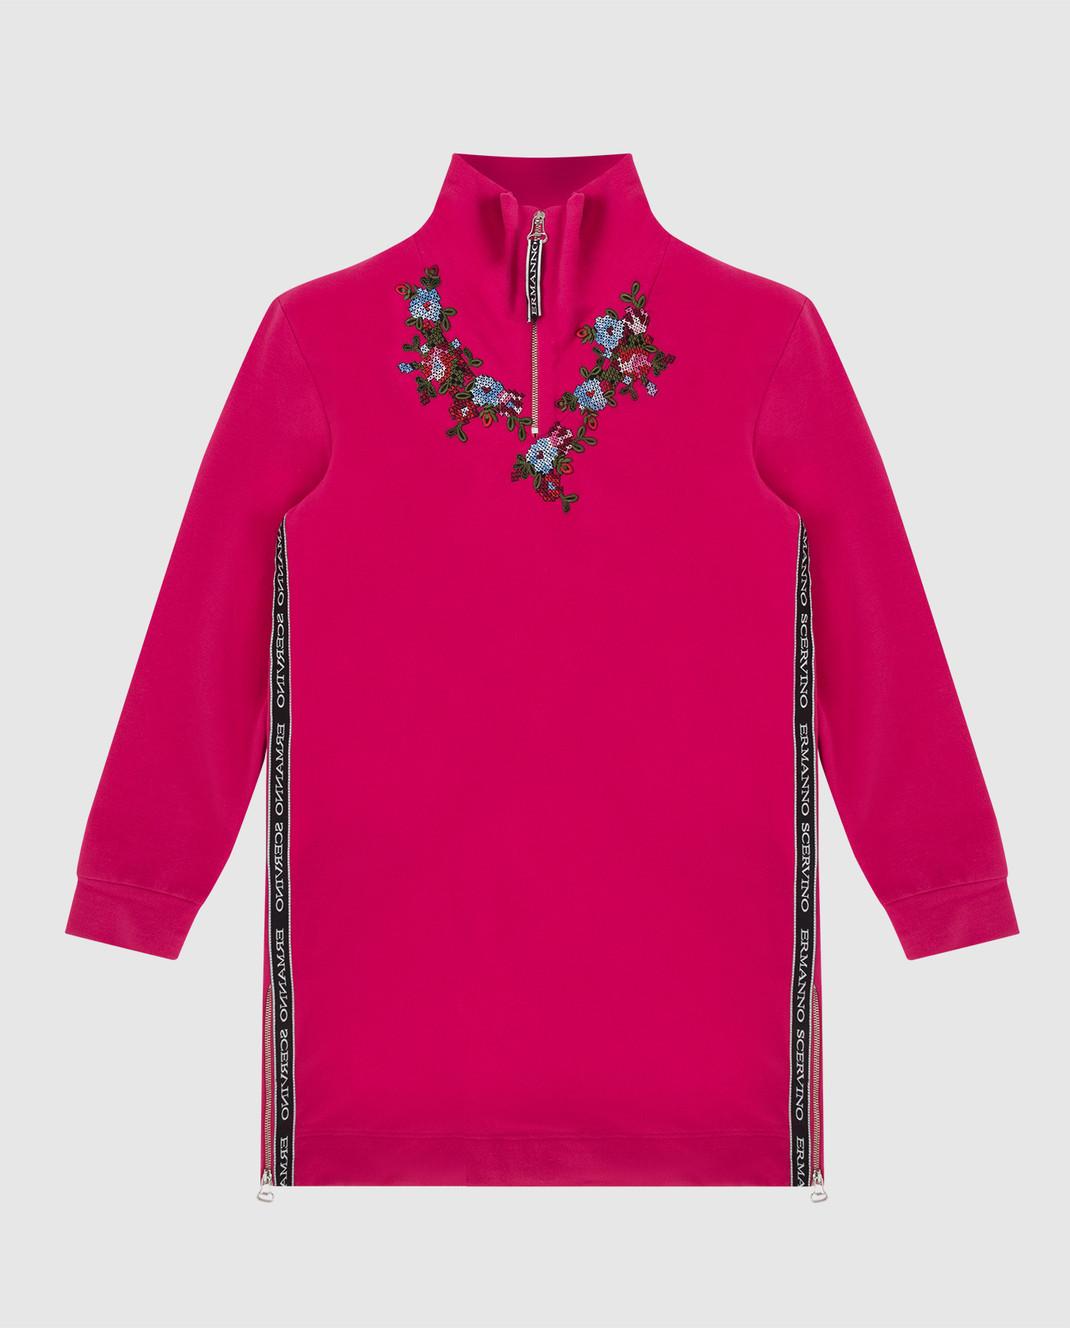 Ermanno Scervino Детское розовое платье AB181012